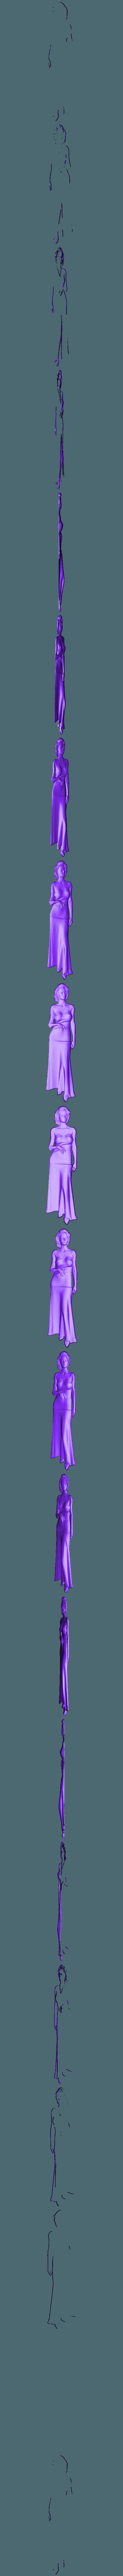 woman4.stl Download STL file Lady • Template to 3D print, garabedovj